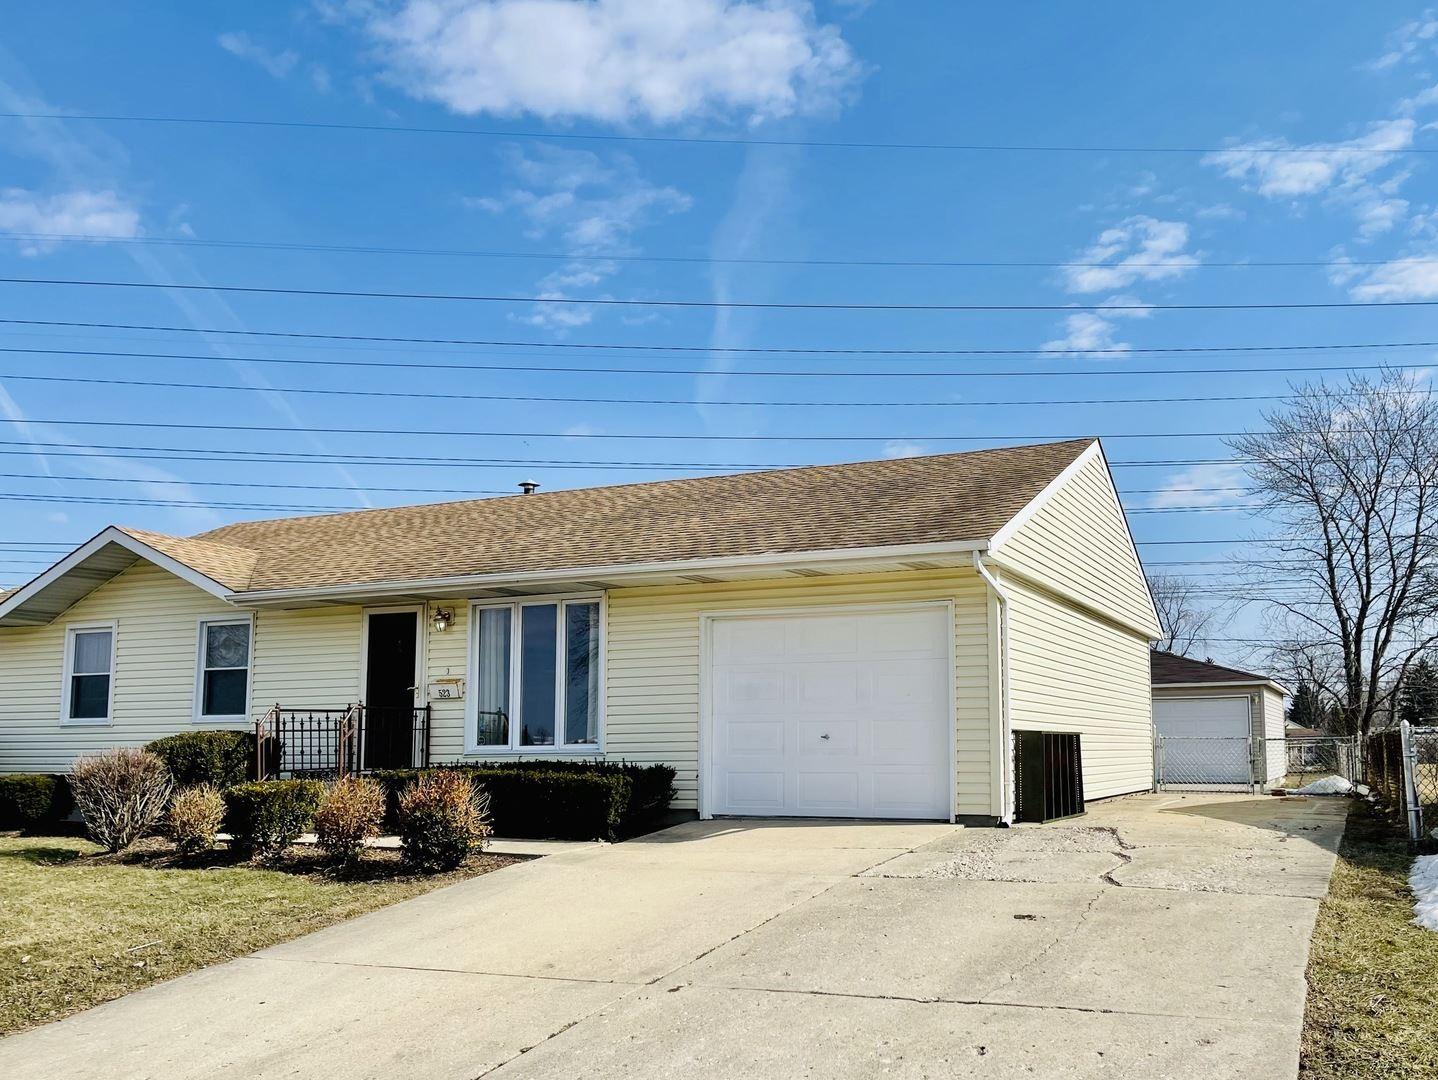 Photo of 523 Belmont Drive, Romeoville, IL 60446 (MLS # 11005925)